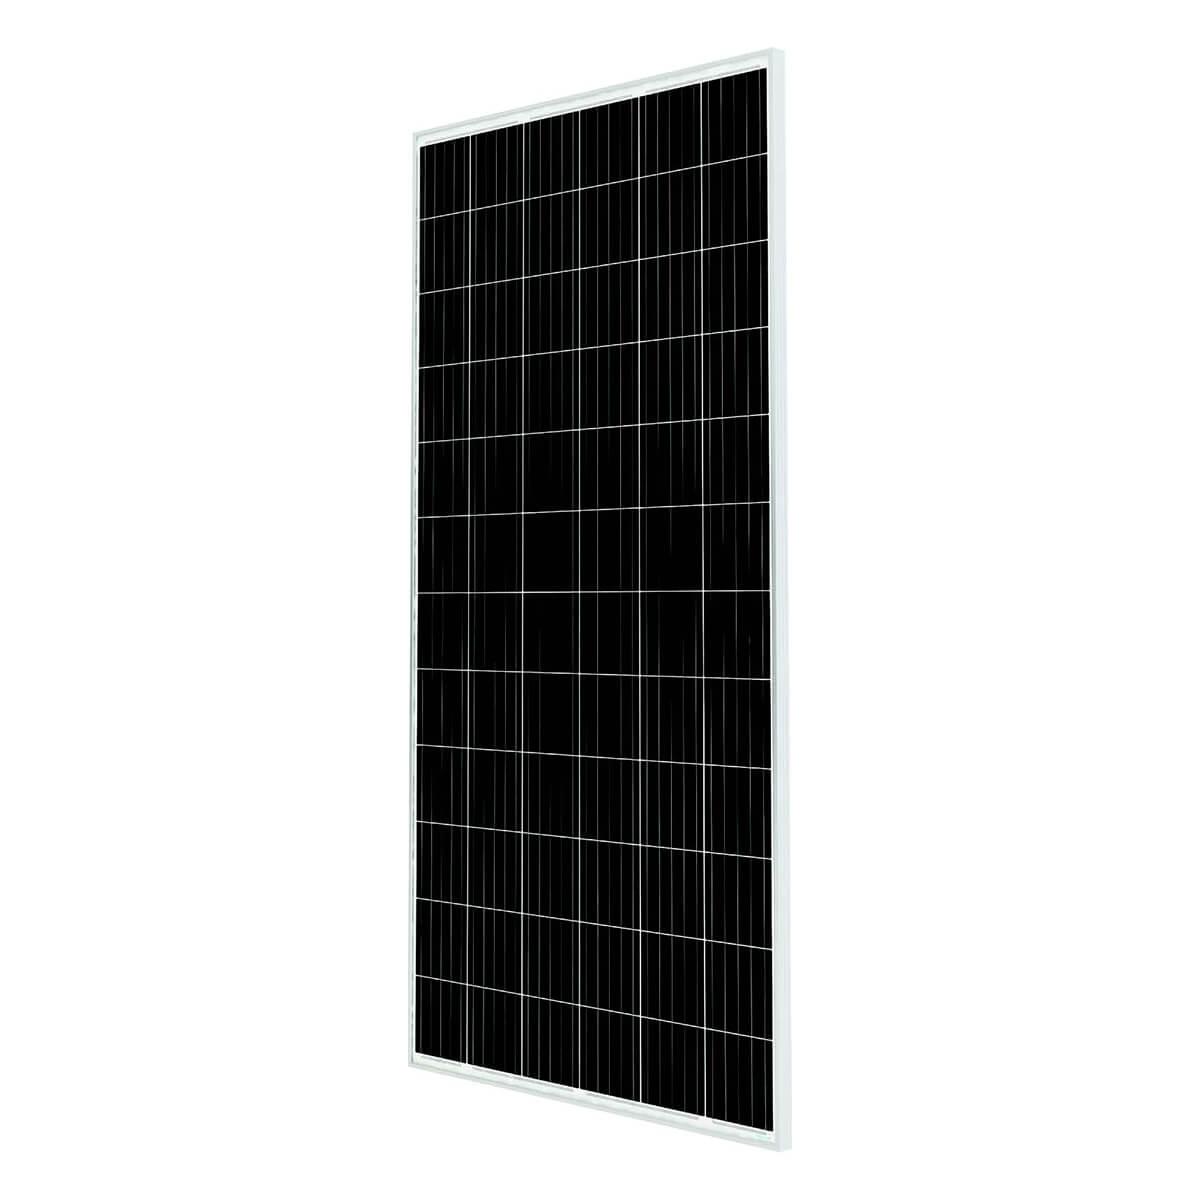 cw enerji 400W panel, cw enerji 400Watt panel, cw enerji 400 W panel, cw enerji 400 Watt panel, cw enerji 400 Watt monokristal panel, cw enerji 400 W watt gunes paneli, cw enerji 400 W watt monokristal gunes paneli, cw enerji 400 W Watt fotovoltaik monokristal solar panel, cw enerji 400W monokristal gunes enerjisi, cw enerji CWT400-72PM-400 panel, CW Enerji 400 WATT